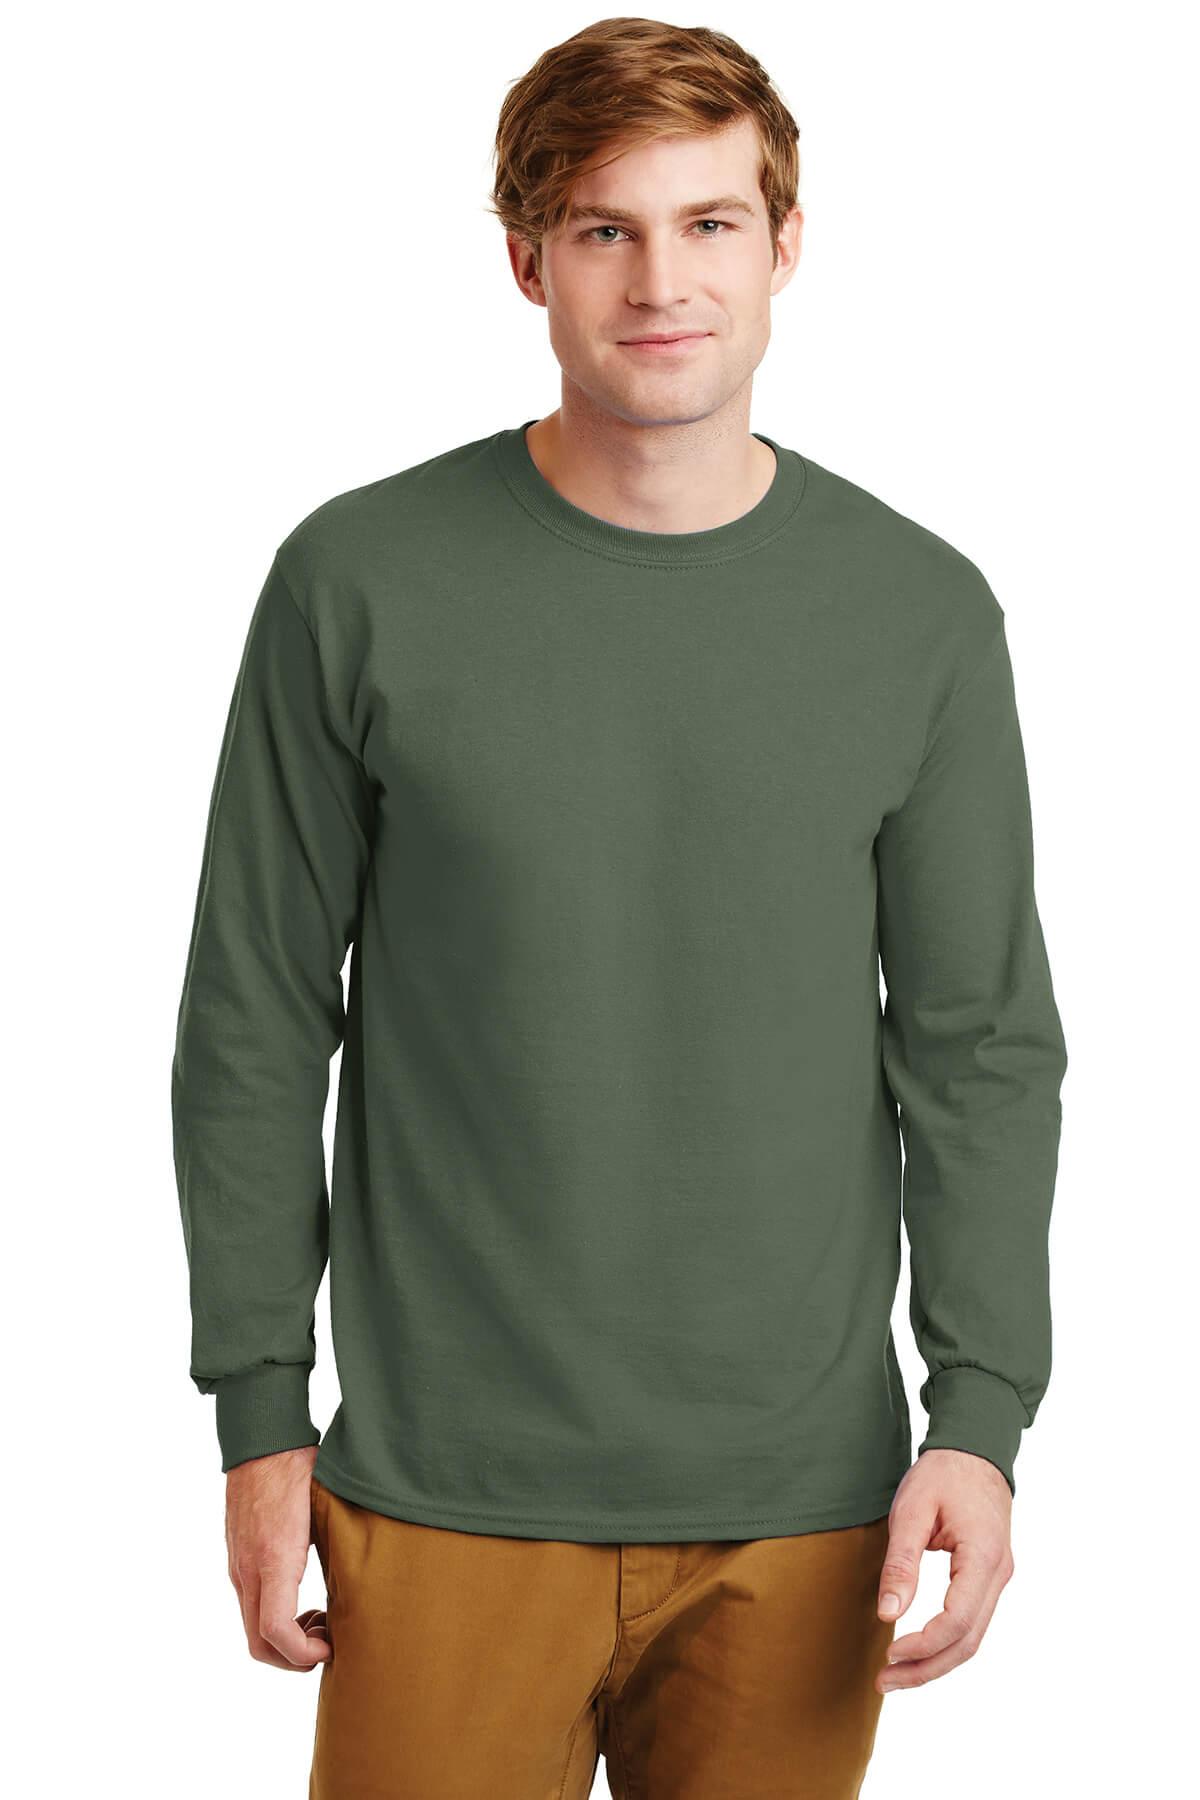 g2400-military-green-2